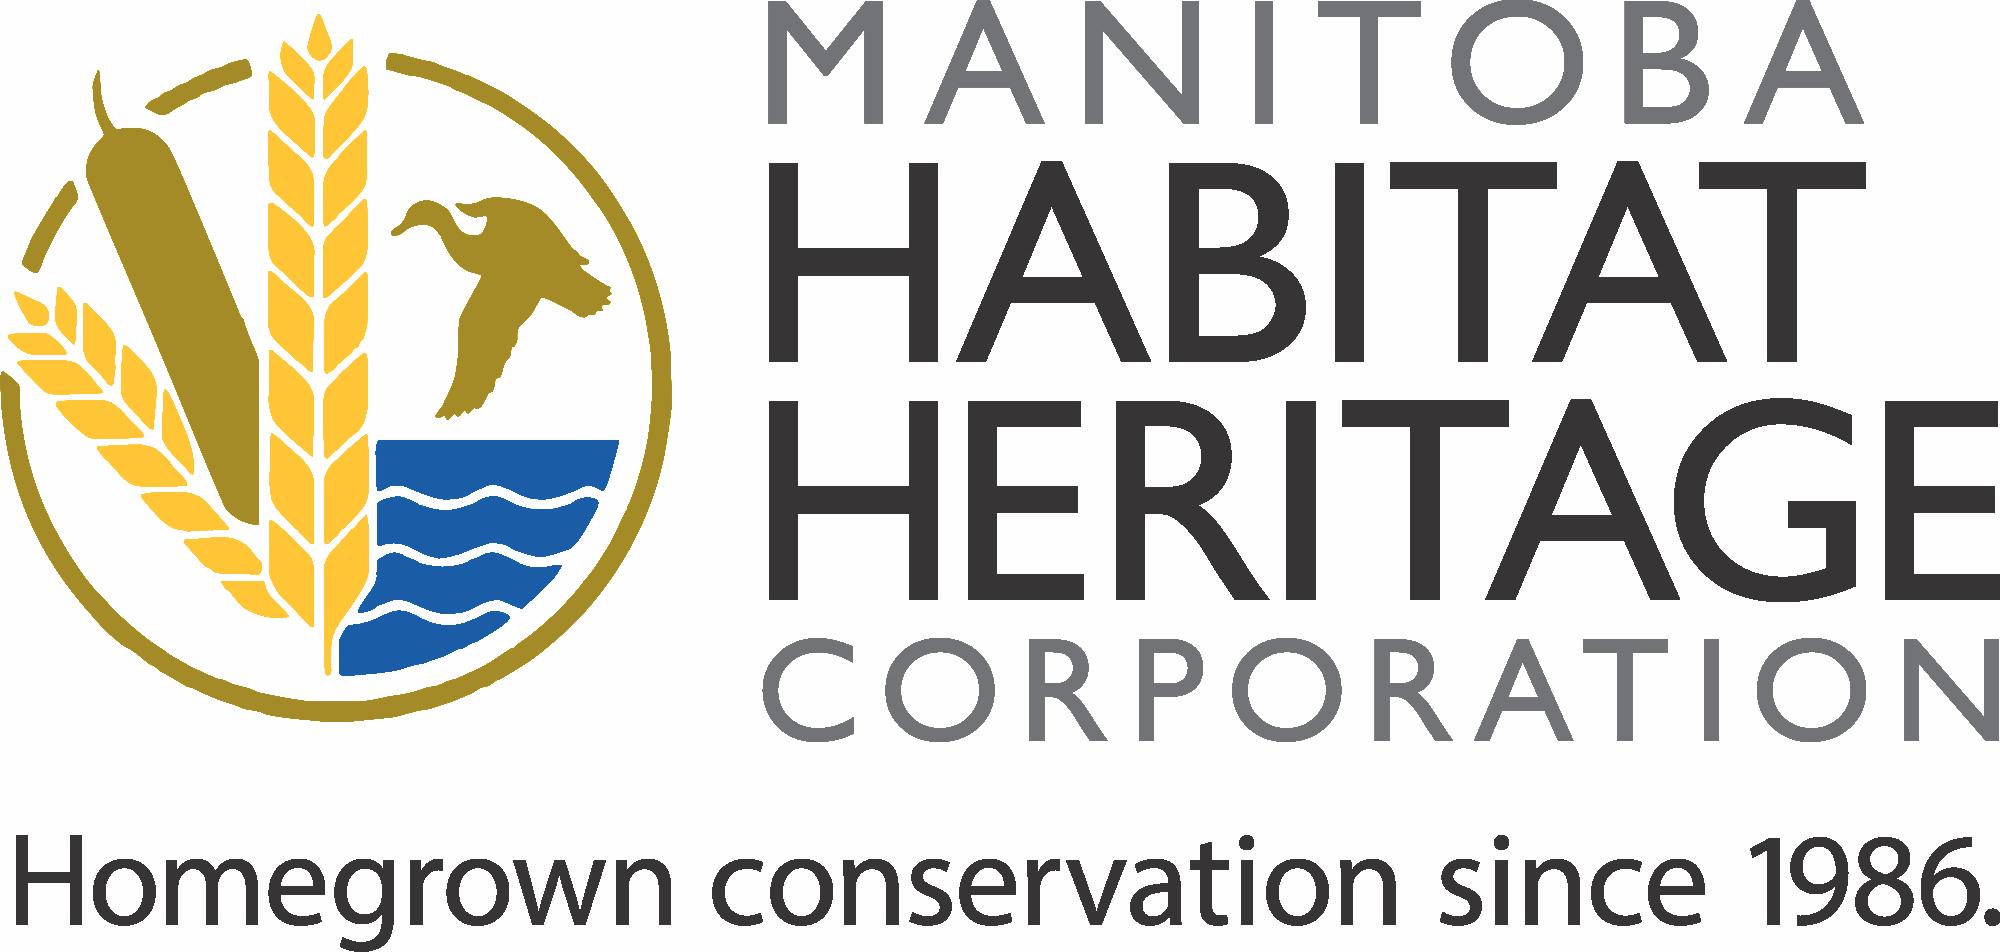 Manitoba Habitat Heritage Corporation